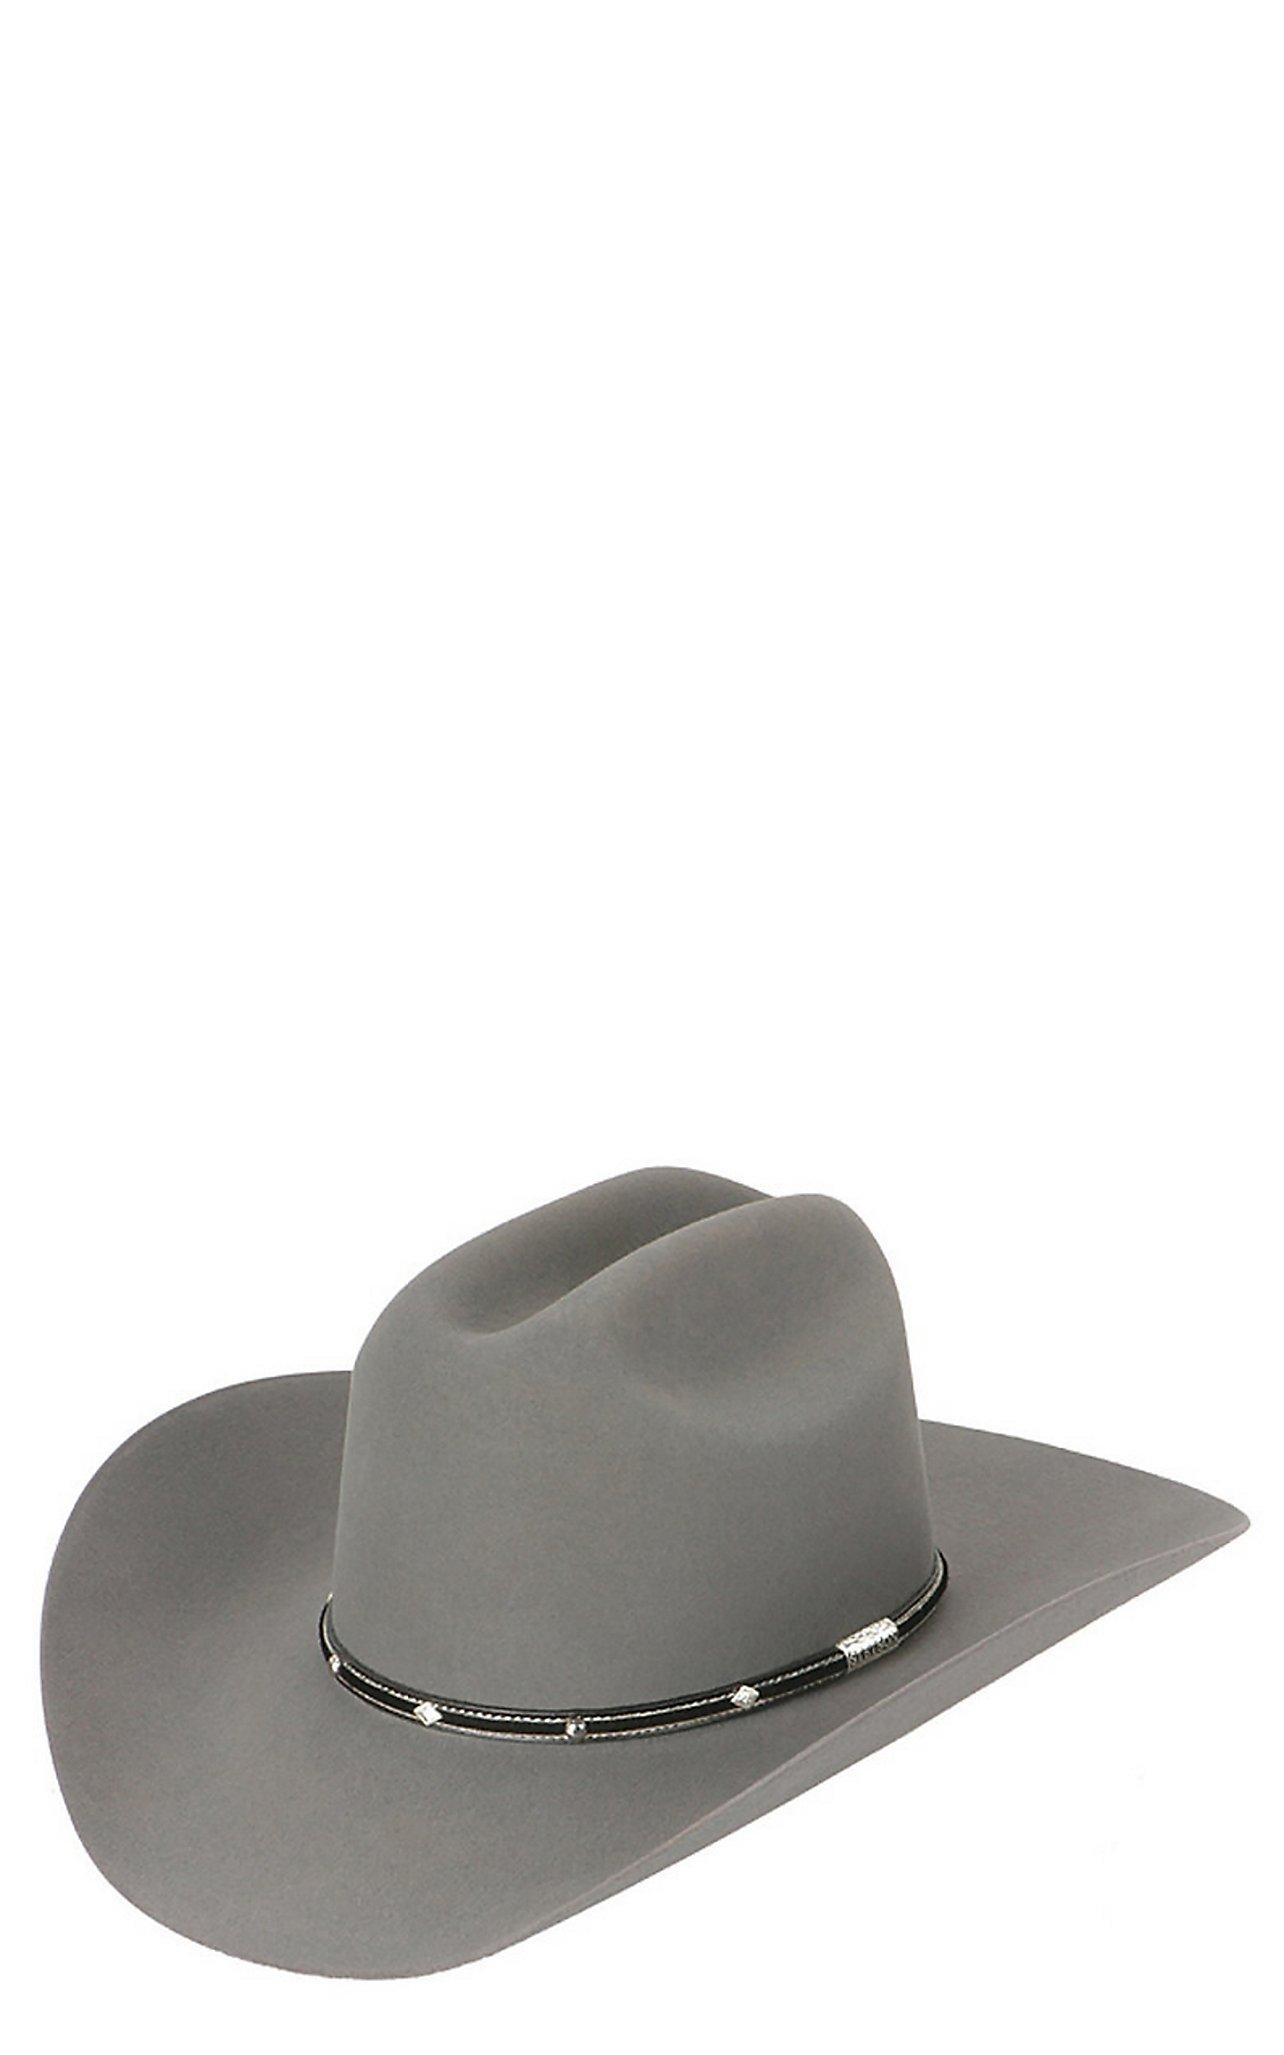 f97597ba5c2 Stetson 6X Angus Granite Grey Felt Cowboy Hat